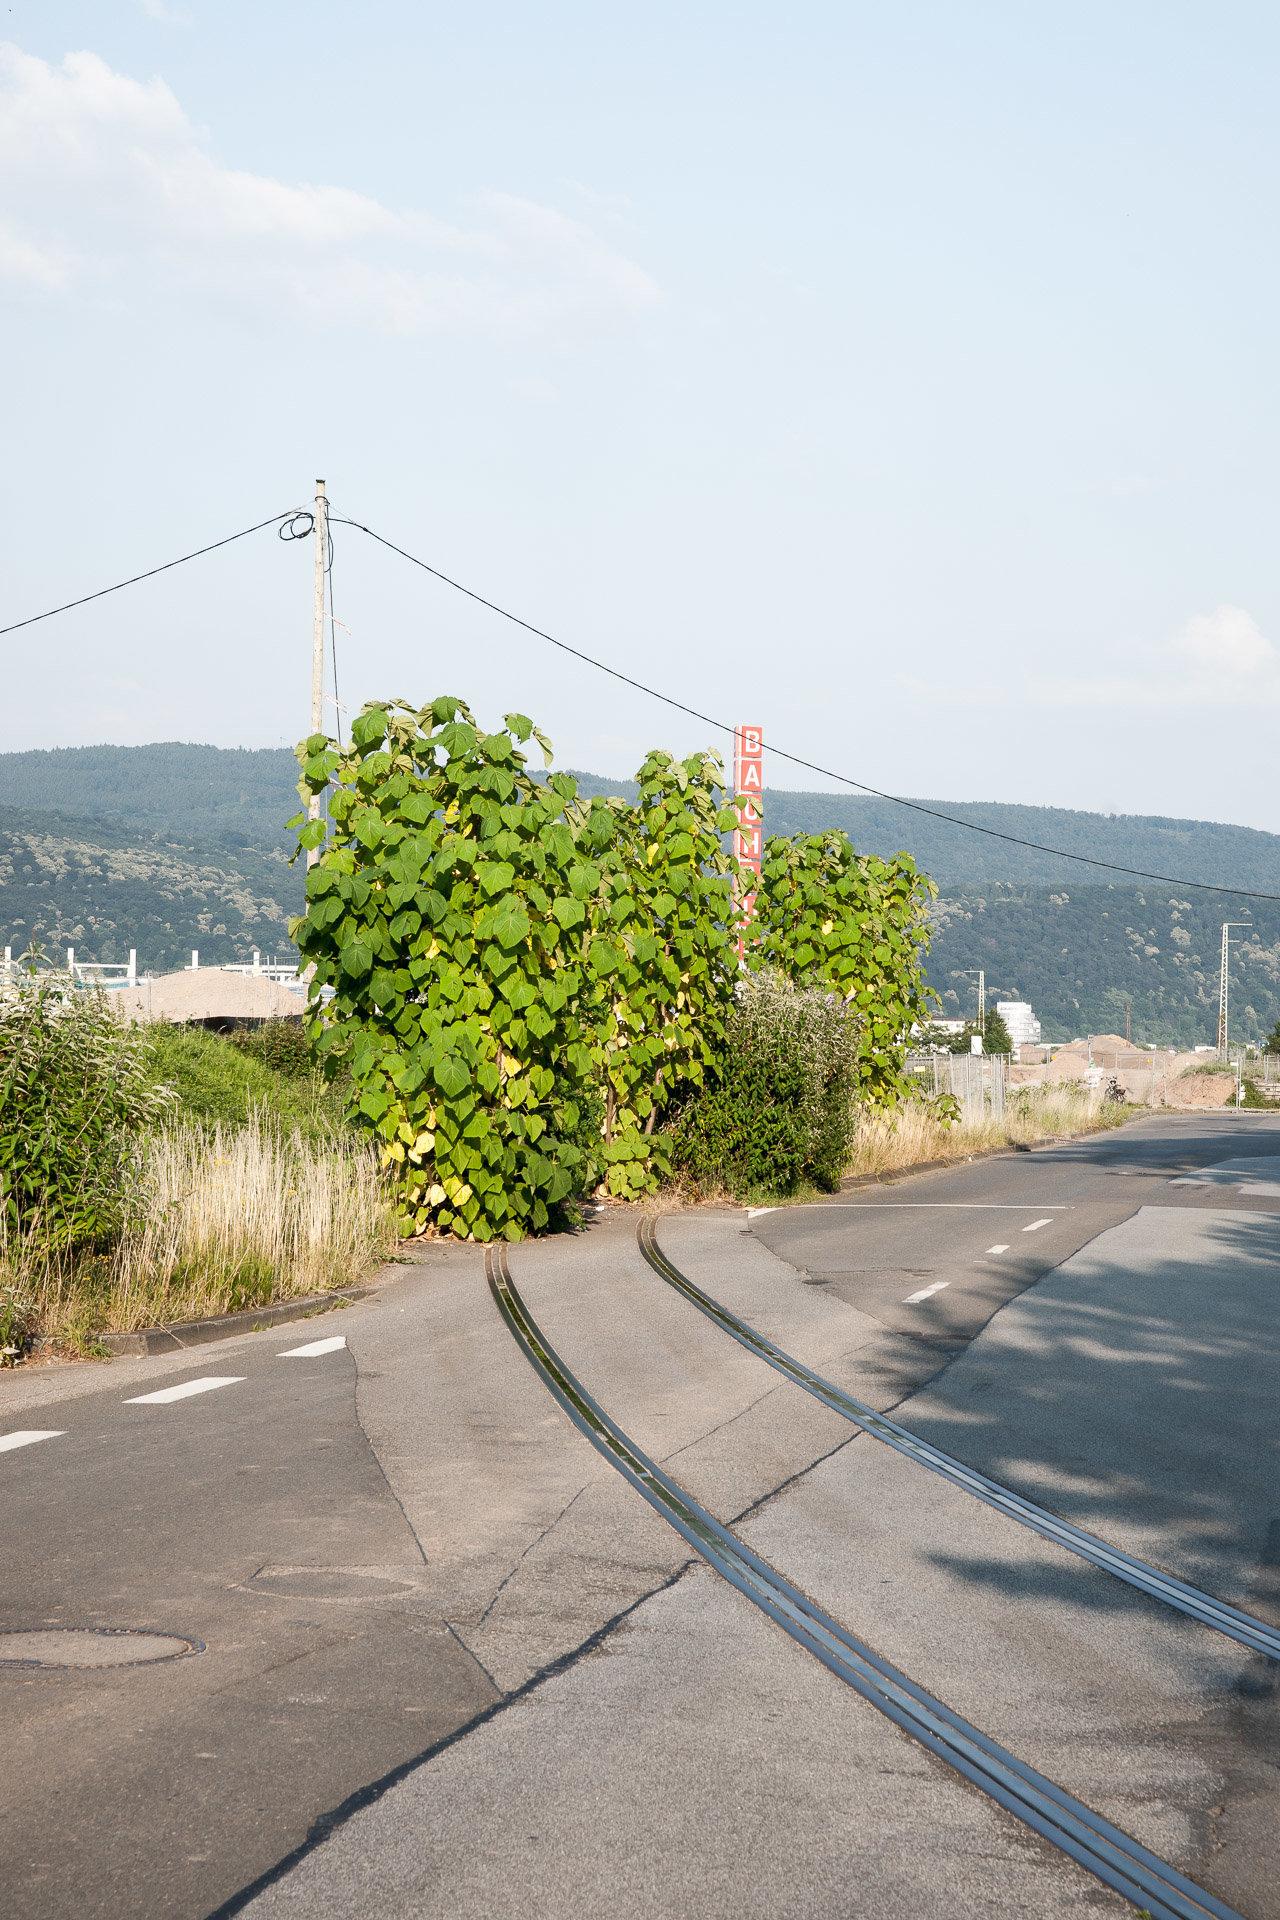 Bahnstadt_28.06.10-1.jpg